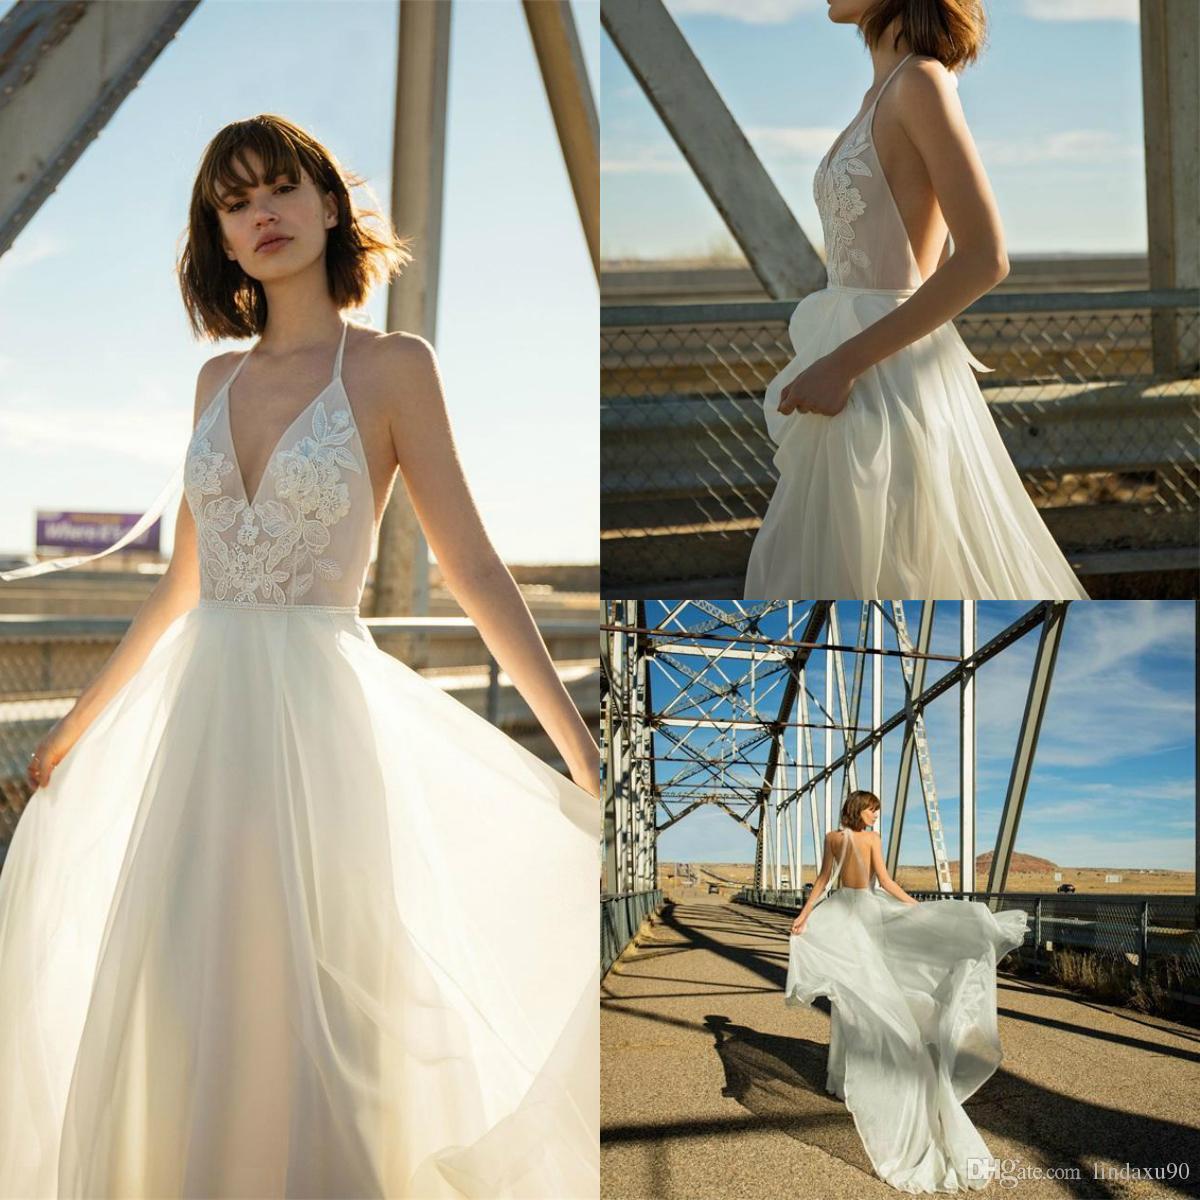 7e500b27b3b1 Bohemia Beach Lace Wedding Dresses 2019 Halter Neck Backless Sweep ...